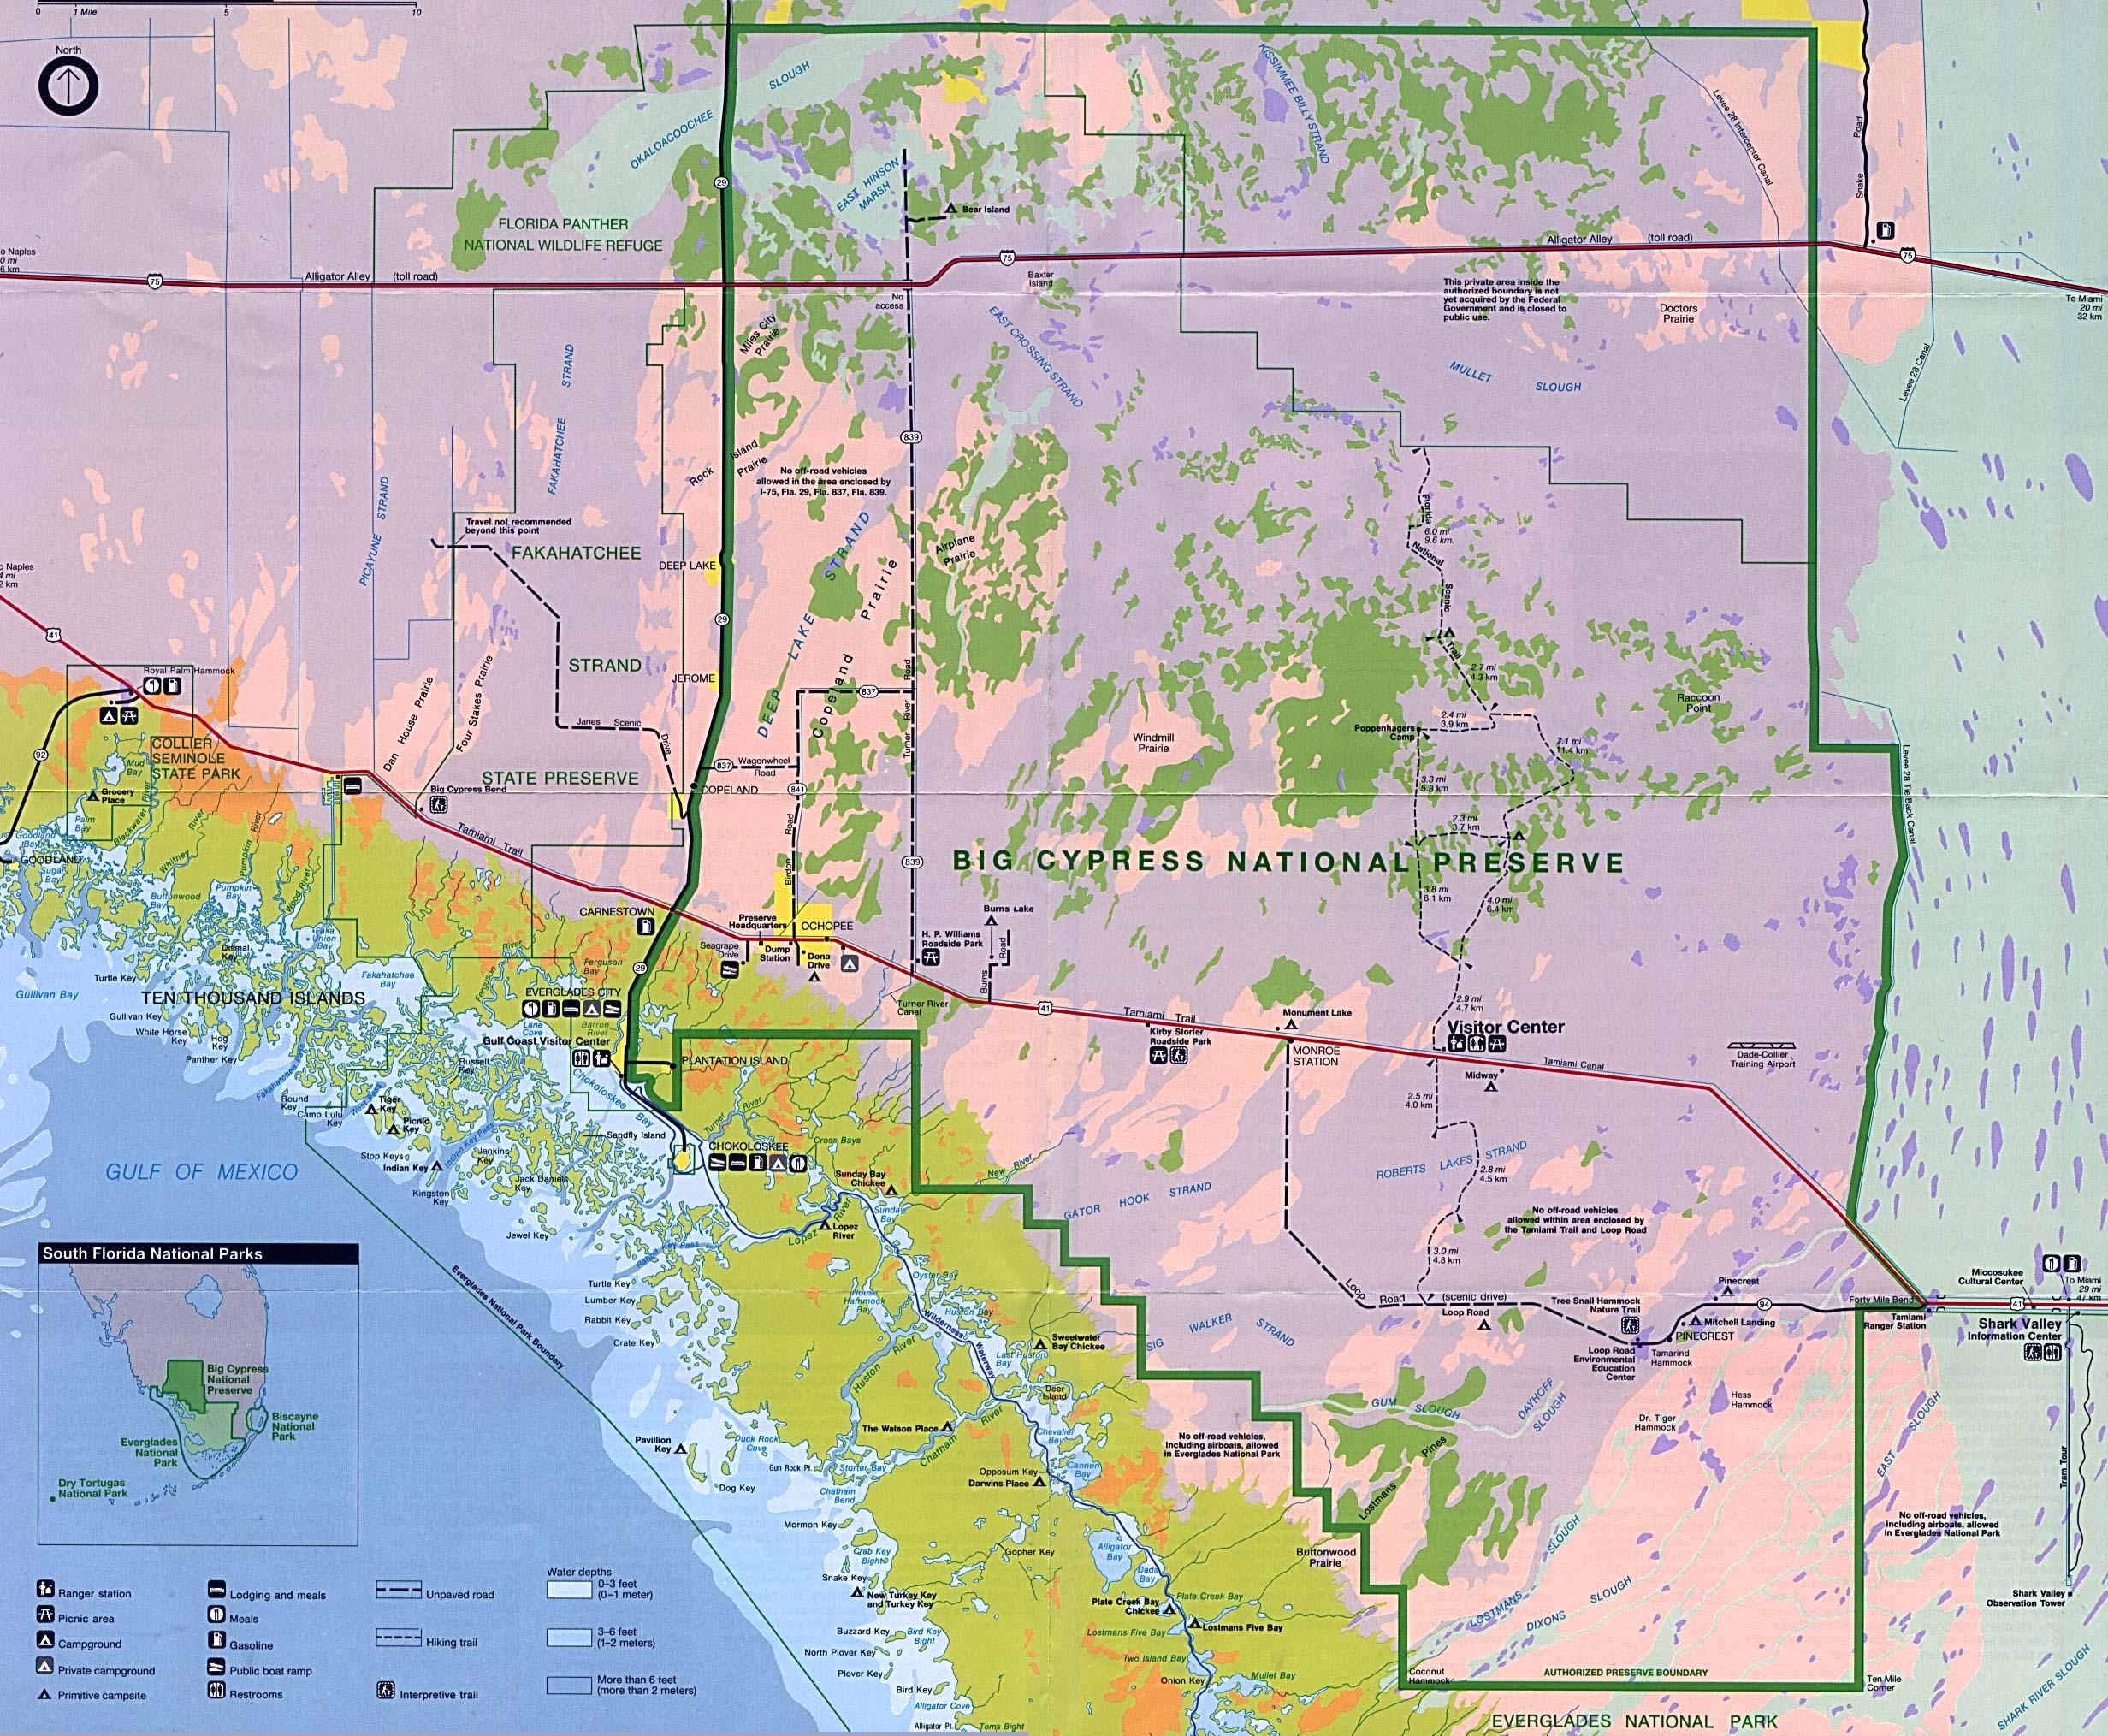 Mapa del Parque de la Reserva Natural Nacional Big Cypress, Florida, Estados Unidos